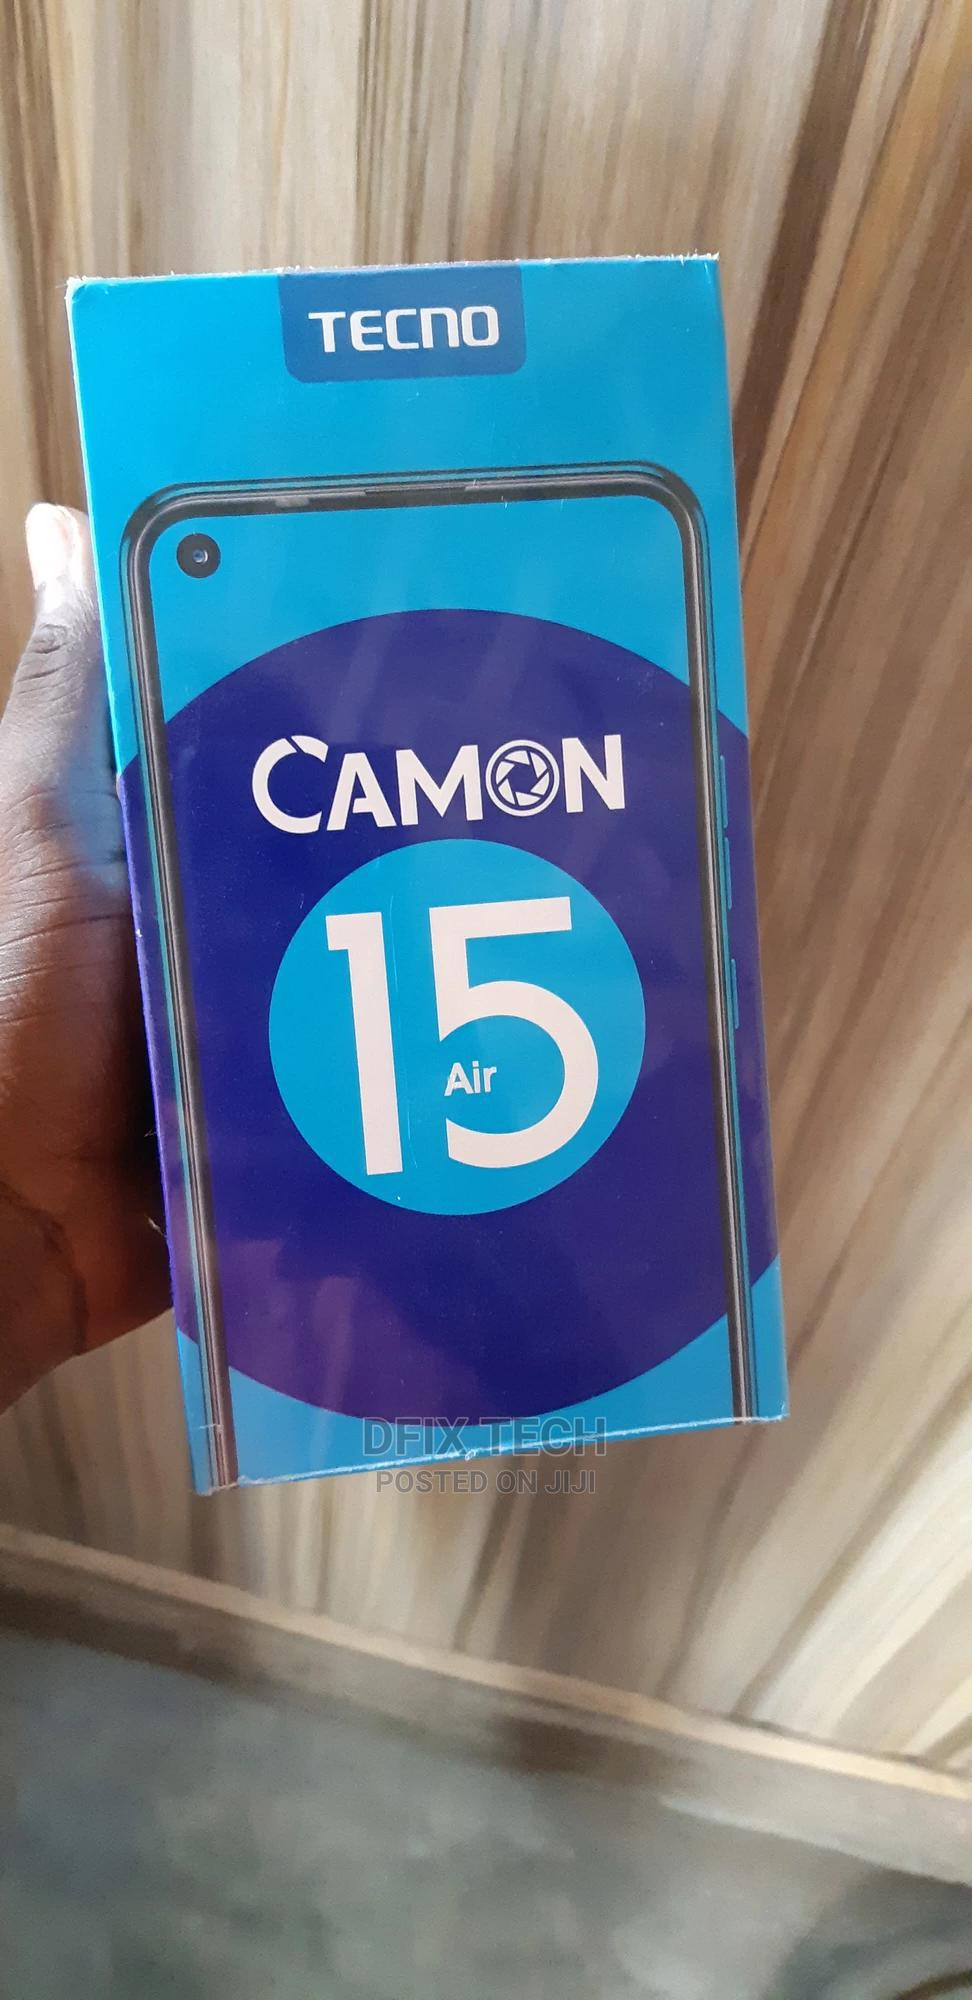 Archive: New Tecno Camon 15 Air 64 GB Blue